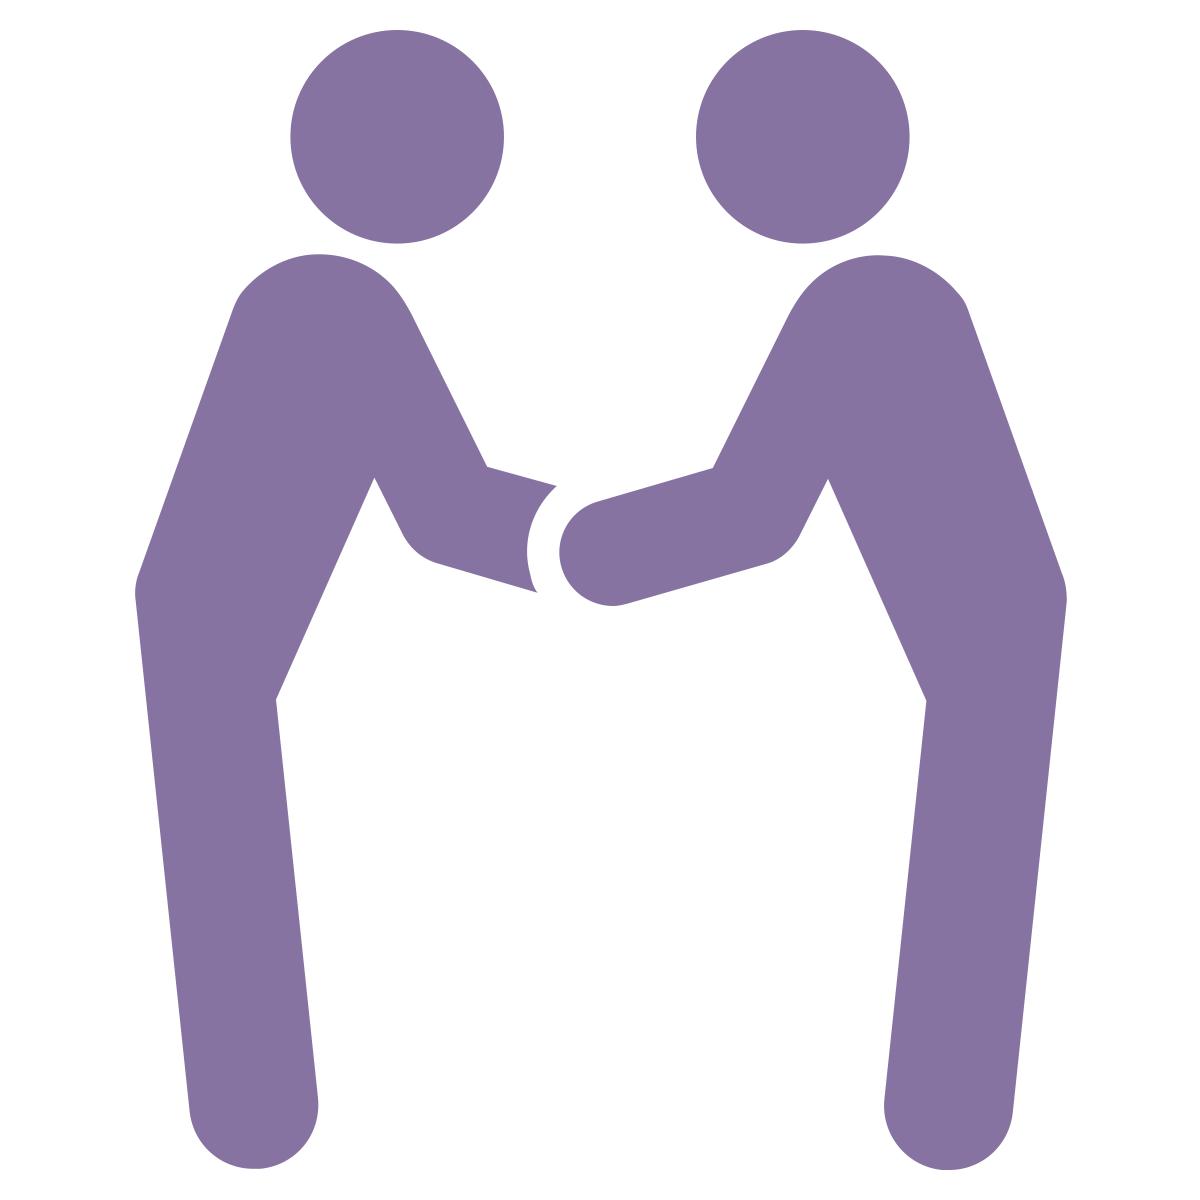 noun_Handshake_1826973_8673a1